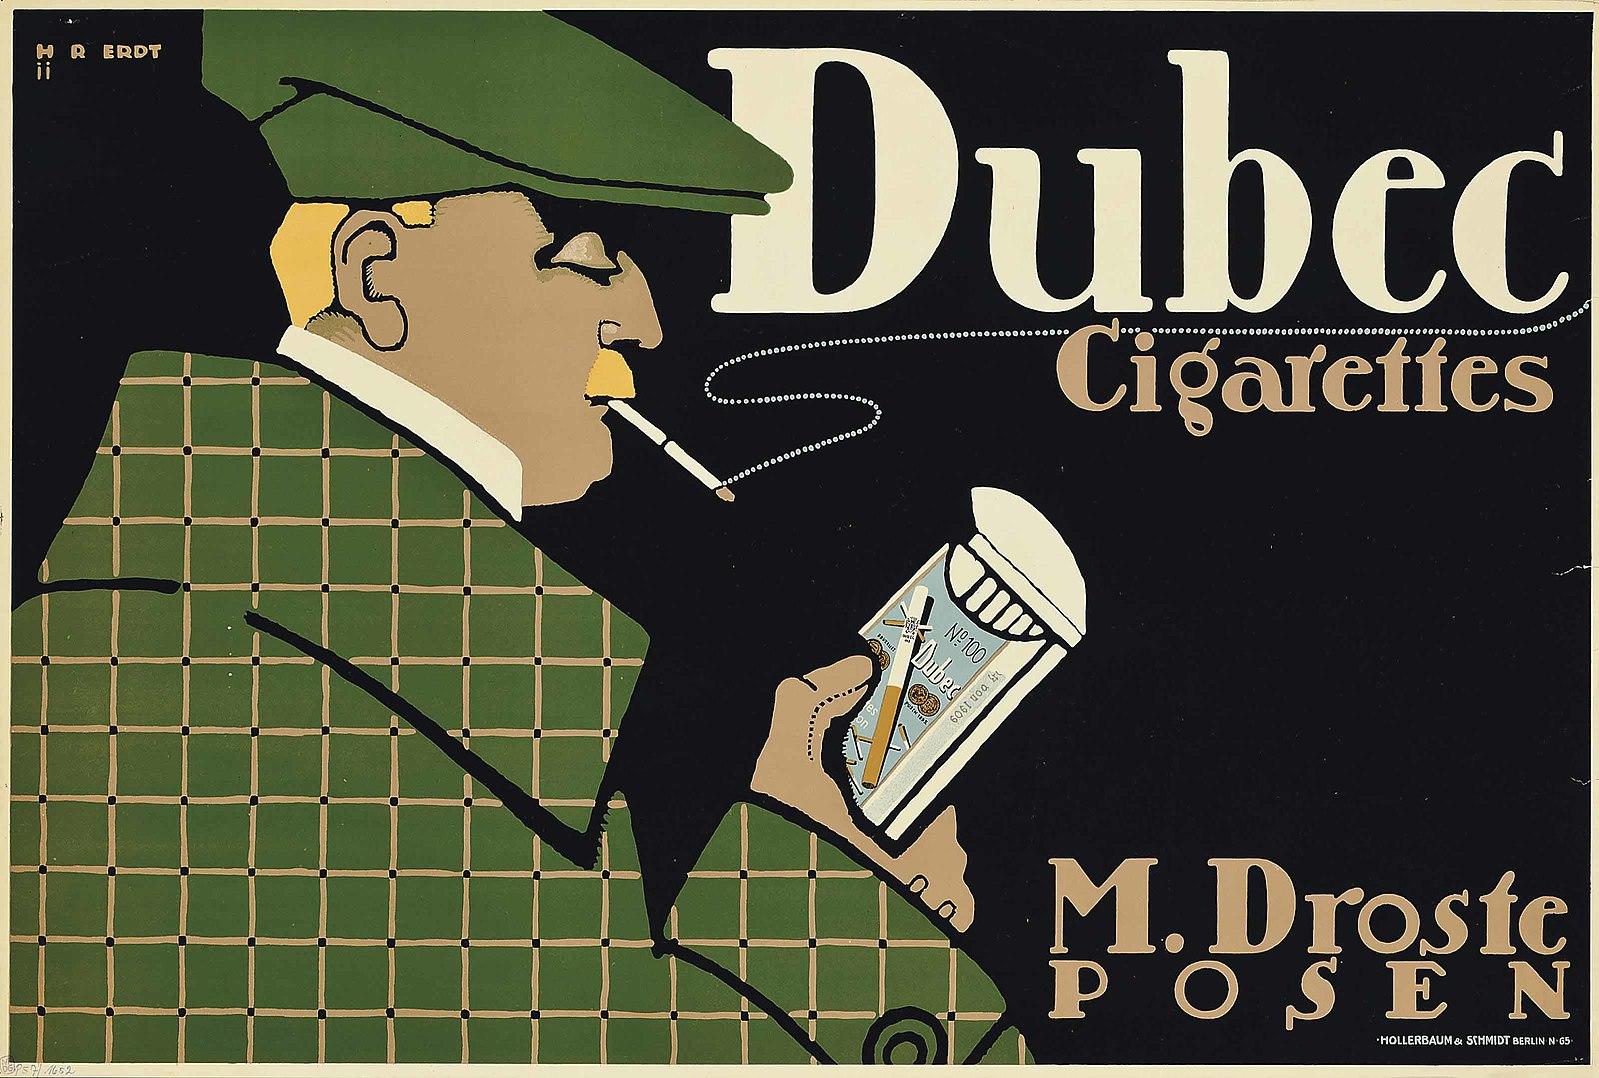 1910 ca cigarettes Dubec, M. Droste, Posen, affiche Hans Rudi Erdt ,